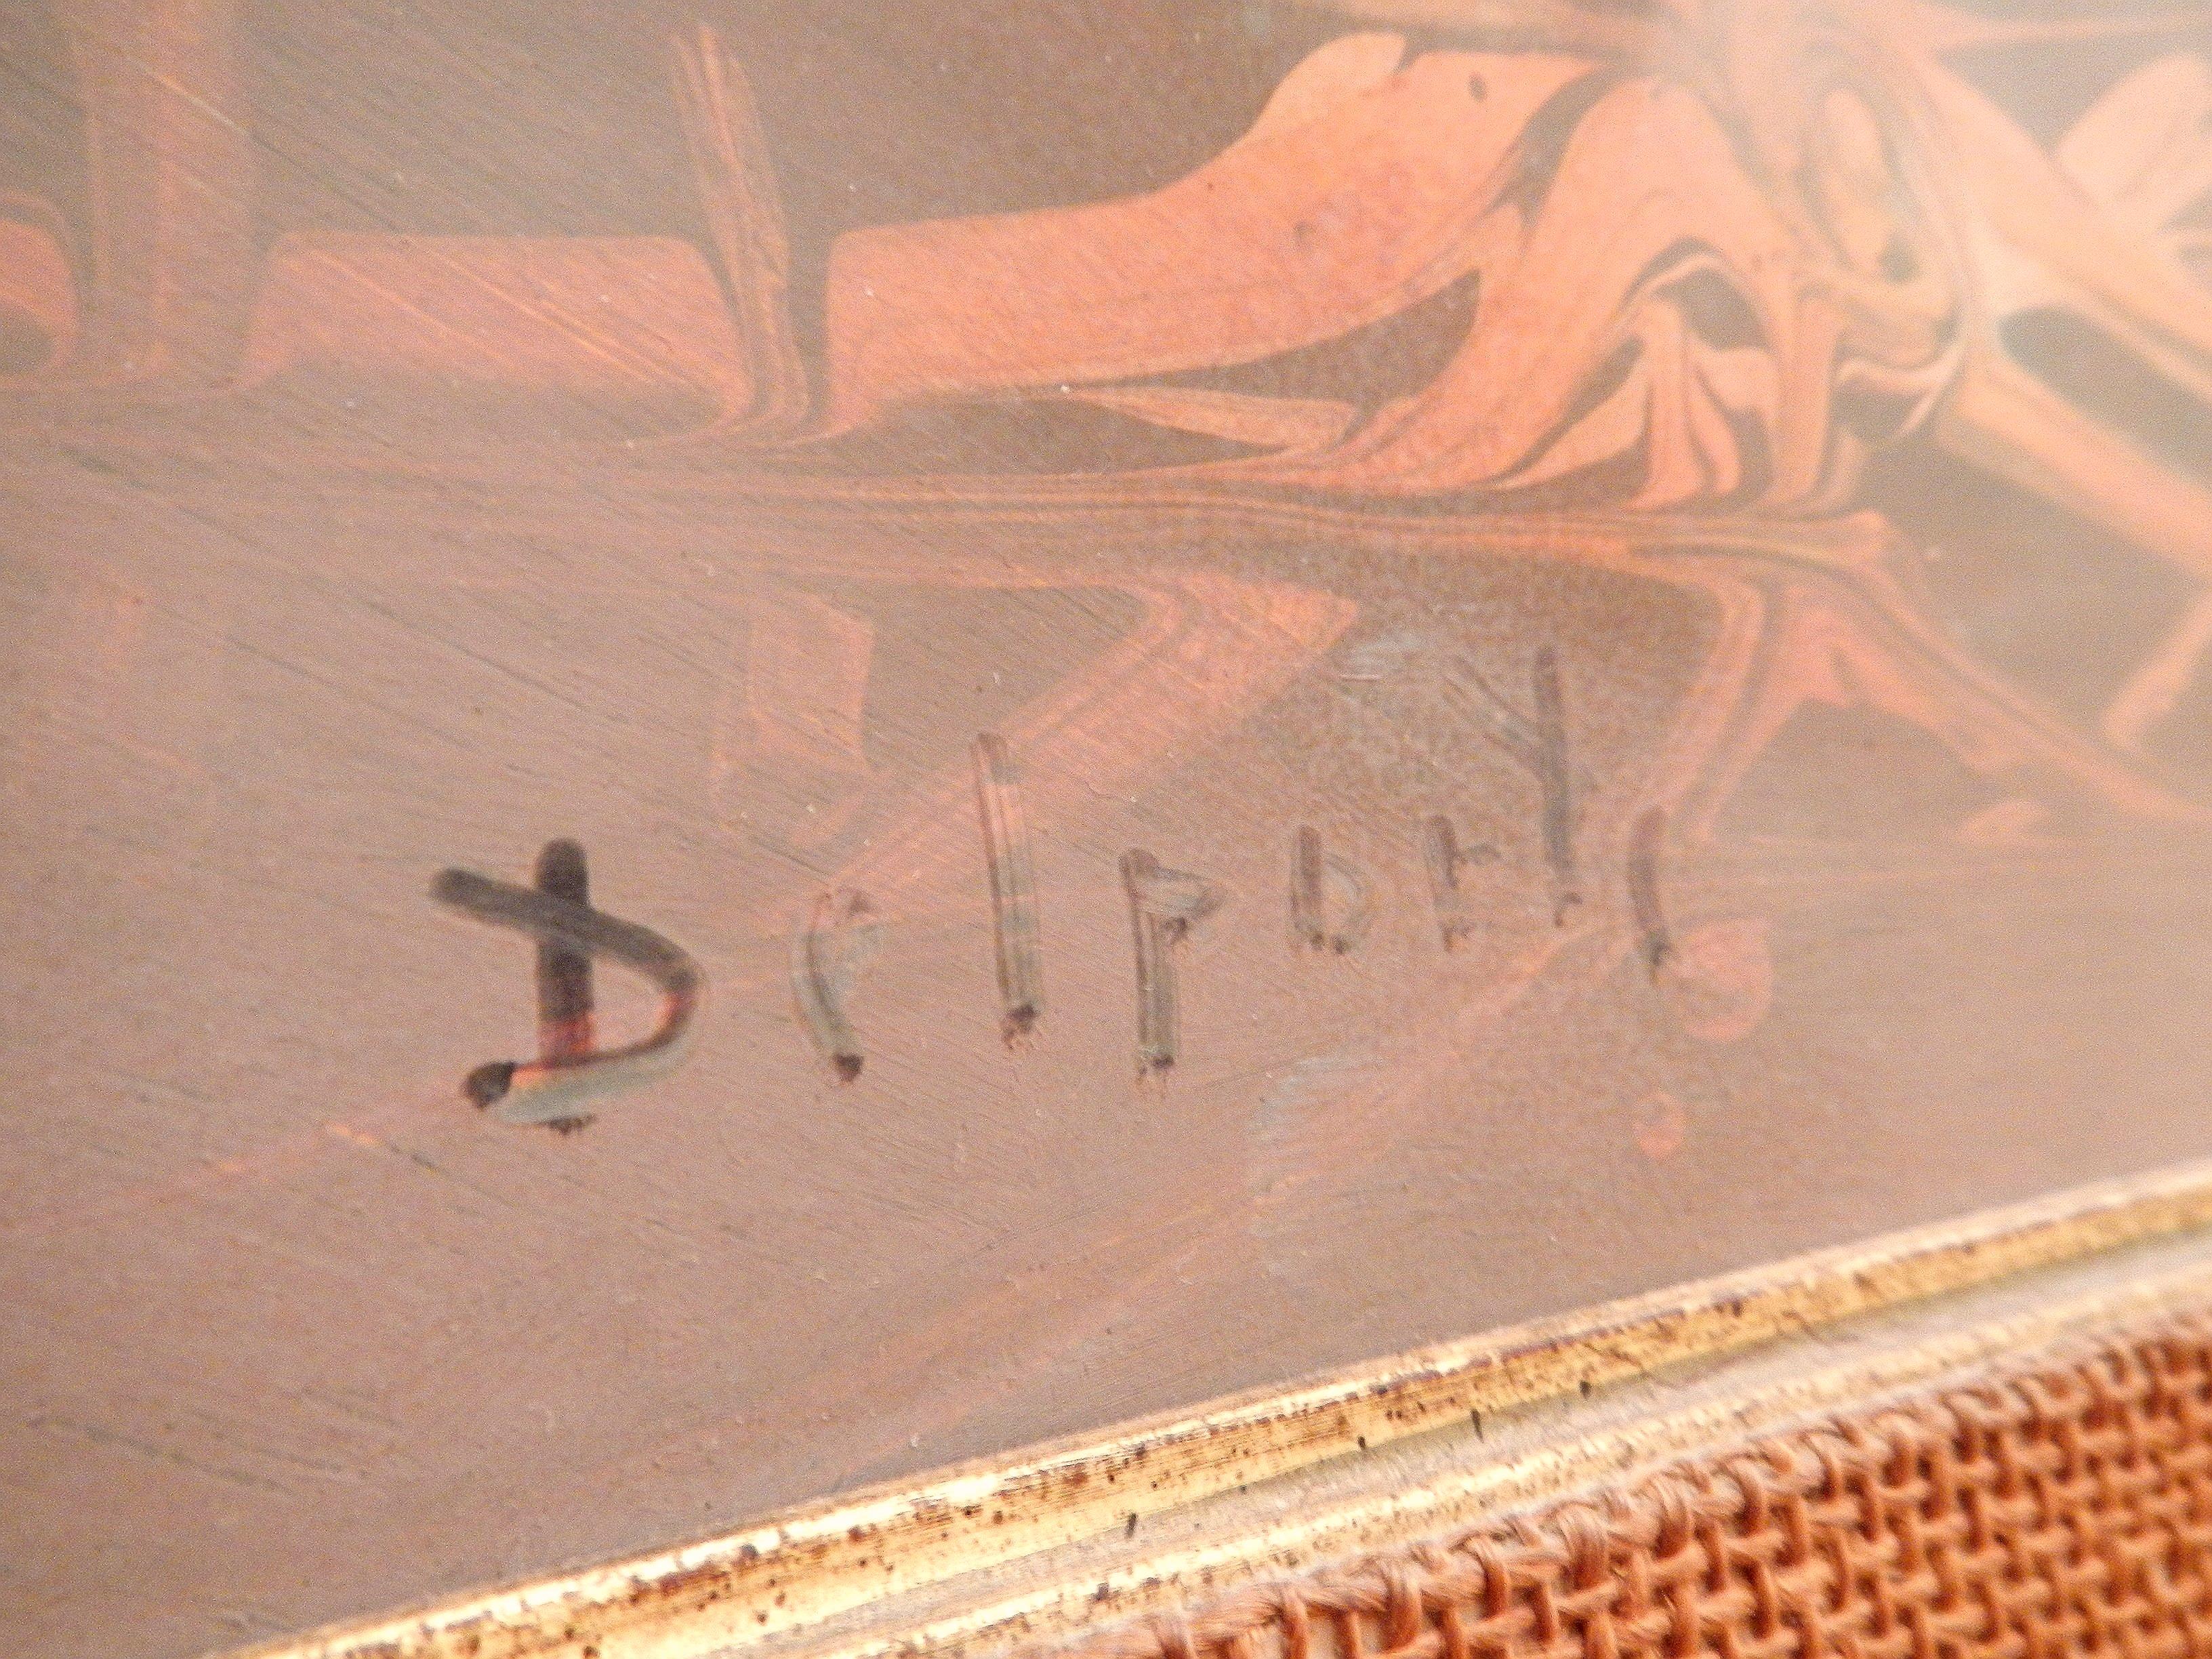 Delporte Charles - Paysage Fantastique - 1976 - signature